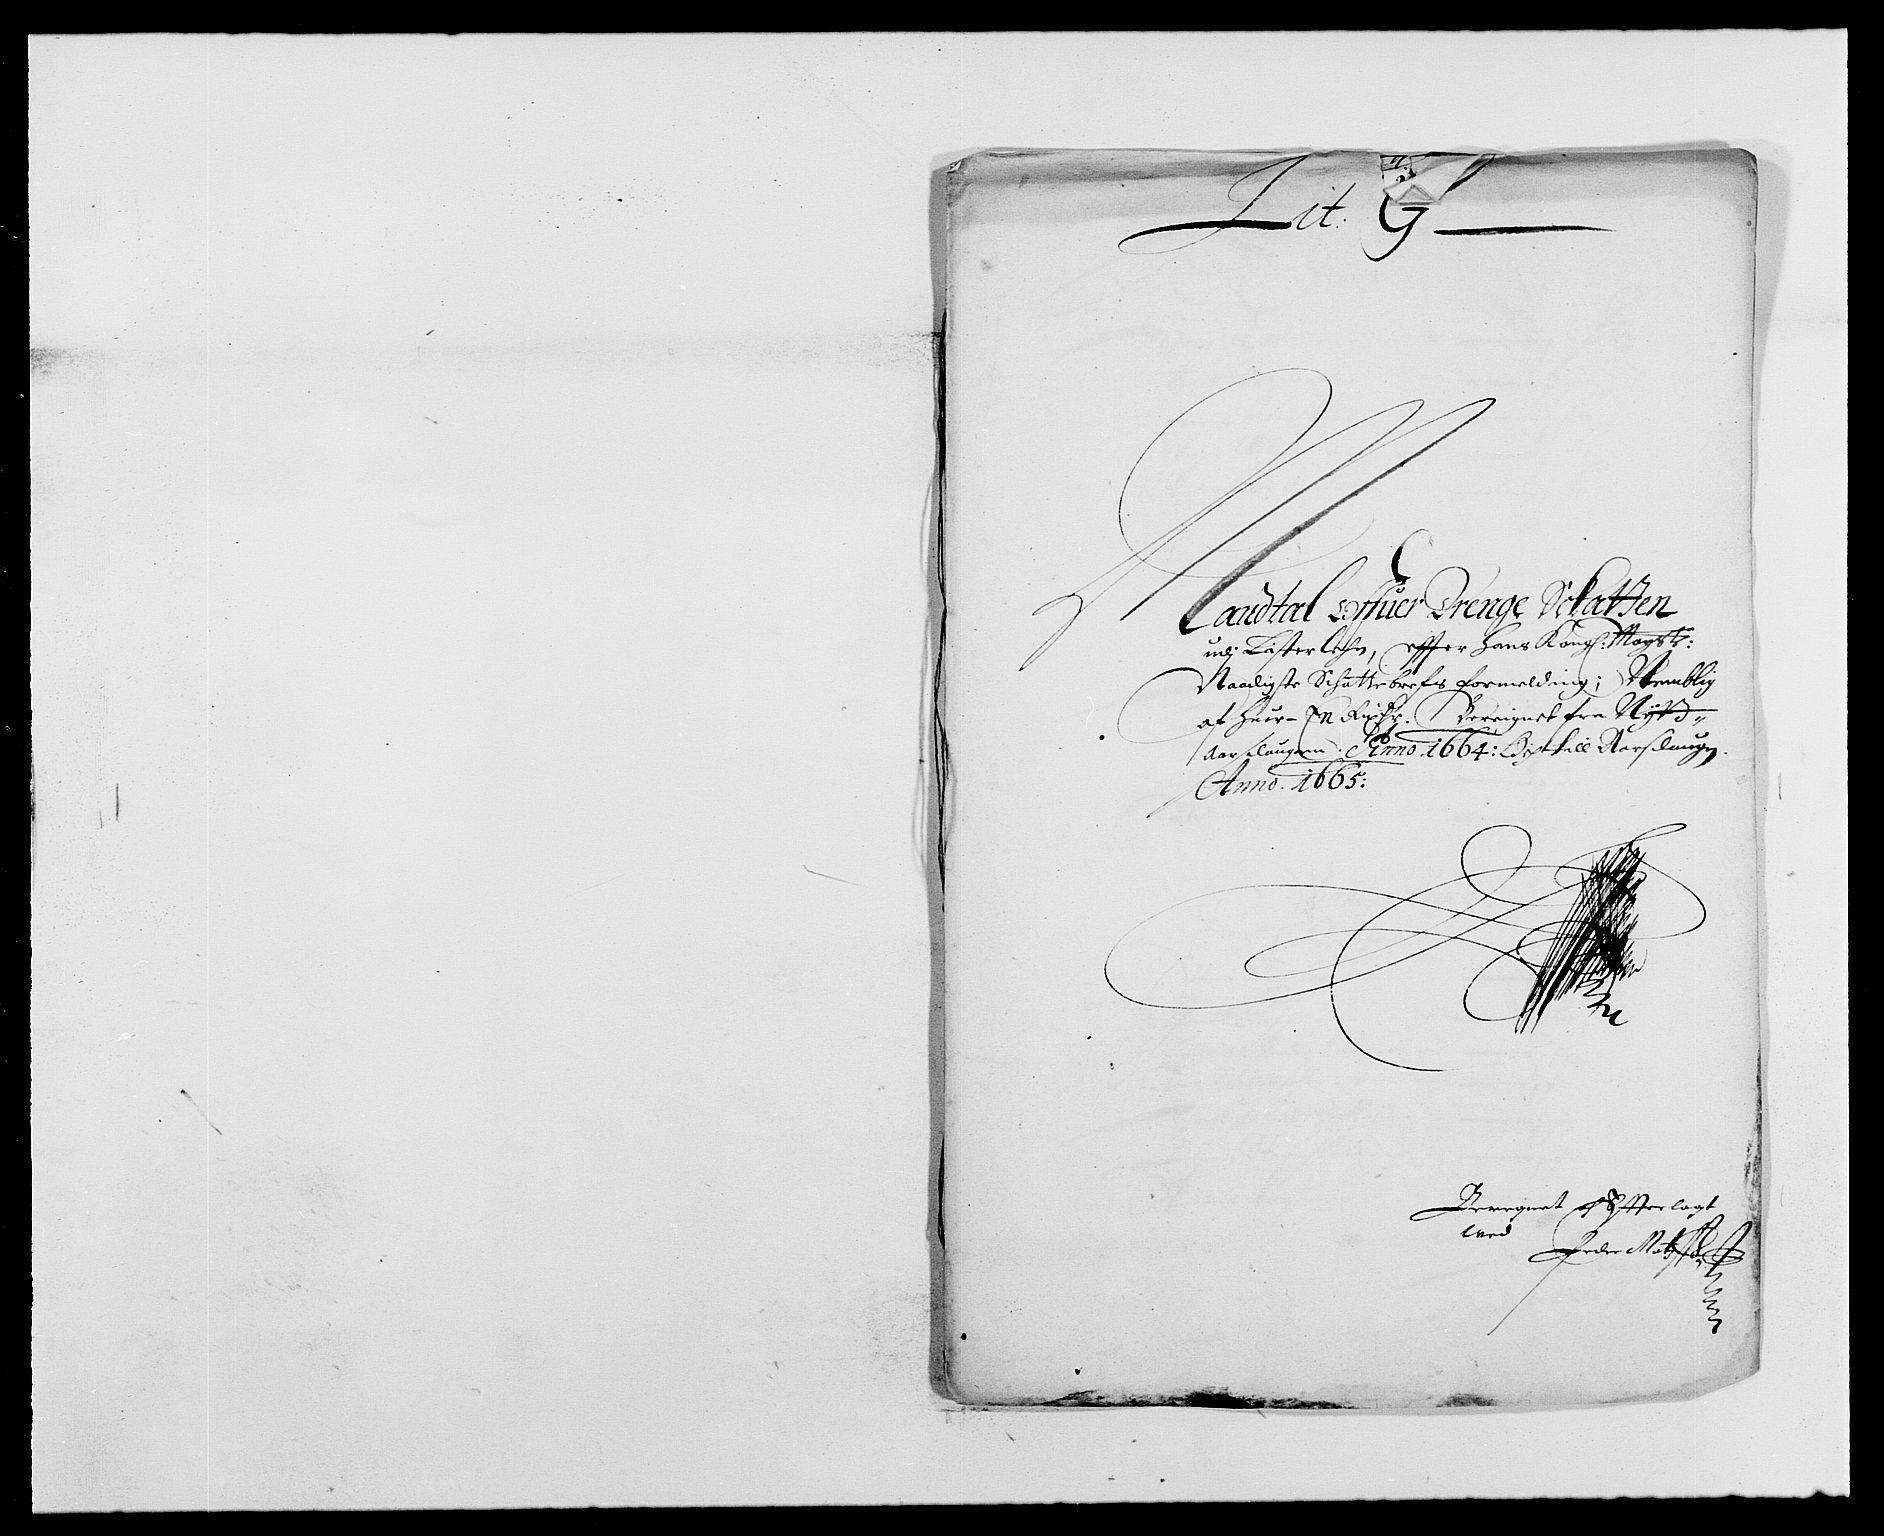 RA, Rentekammeret inntil 1814, Reviderte regnskaper, Fogderegnskap, R41/L2523: Fogderegnskap Lista, 1663-1664, s. 339